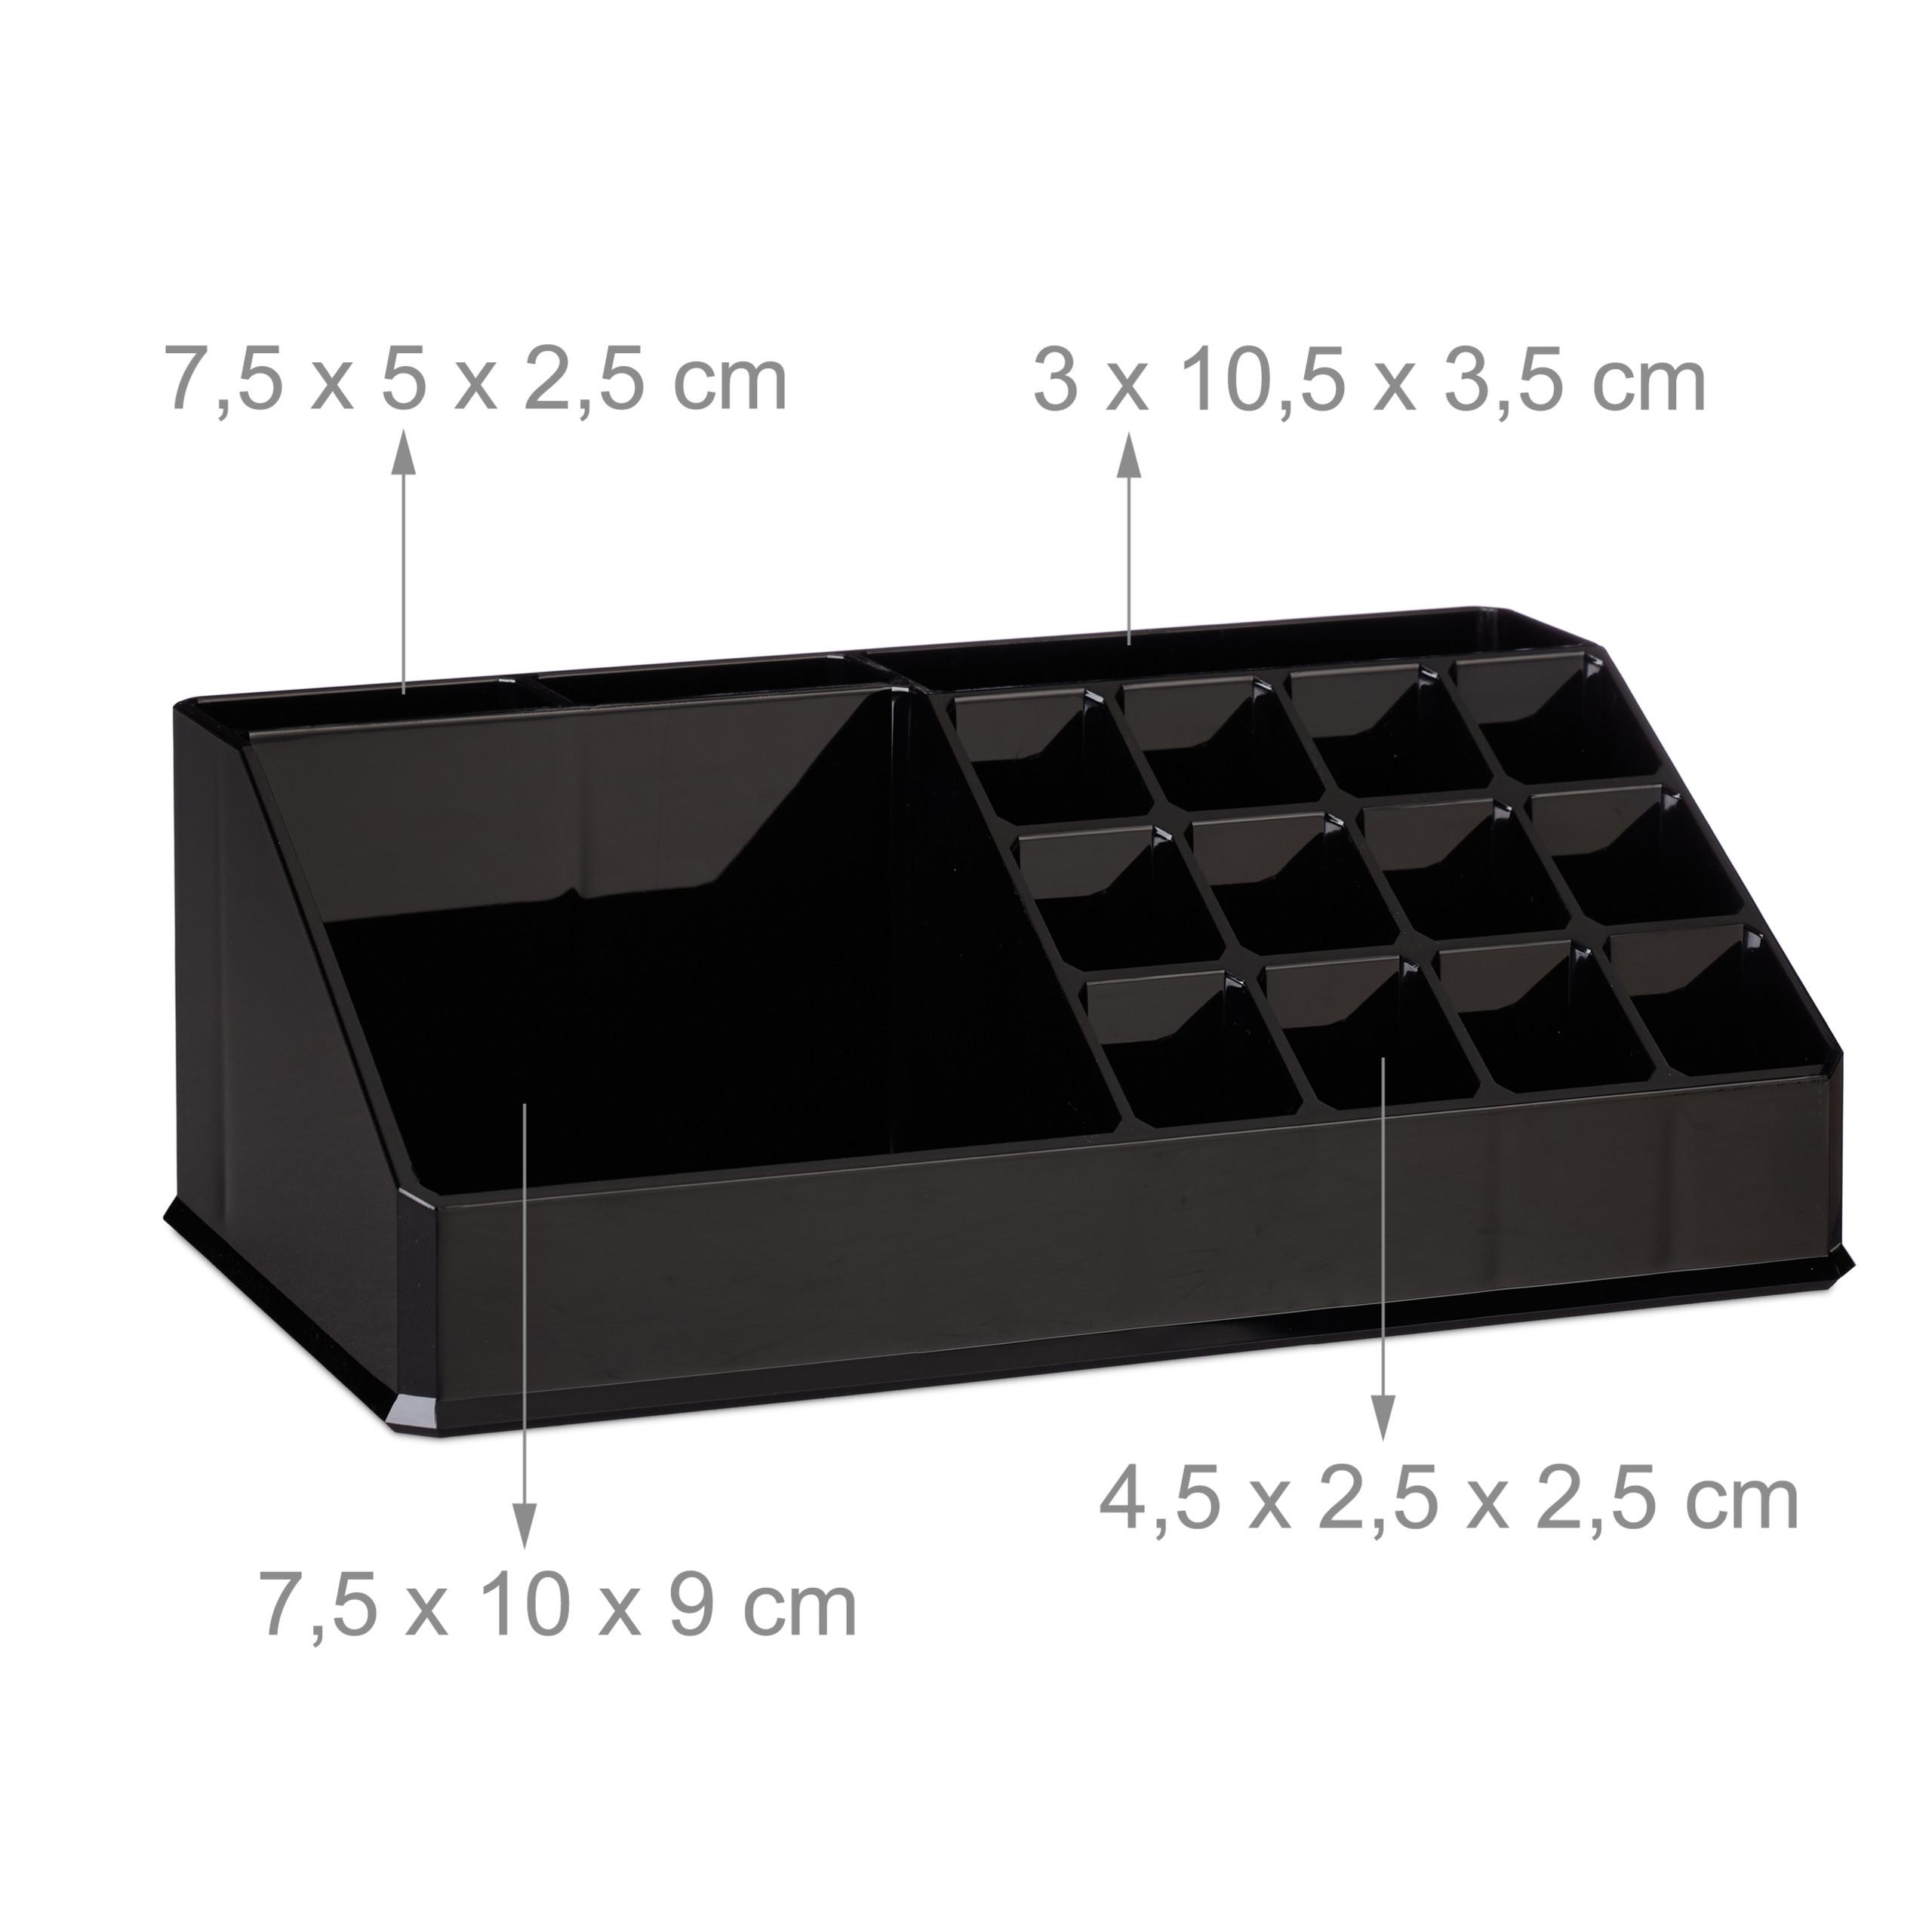 make-up-organizer-met-6-lades-acryl-cosmeticahouder-make-up-cosmetica-opslag miniatuur 29